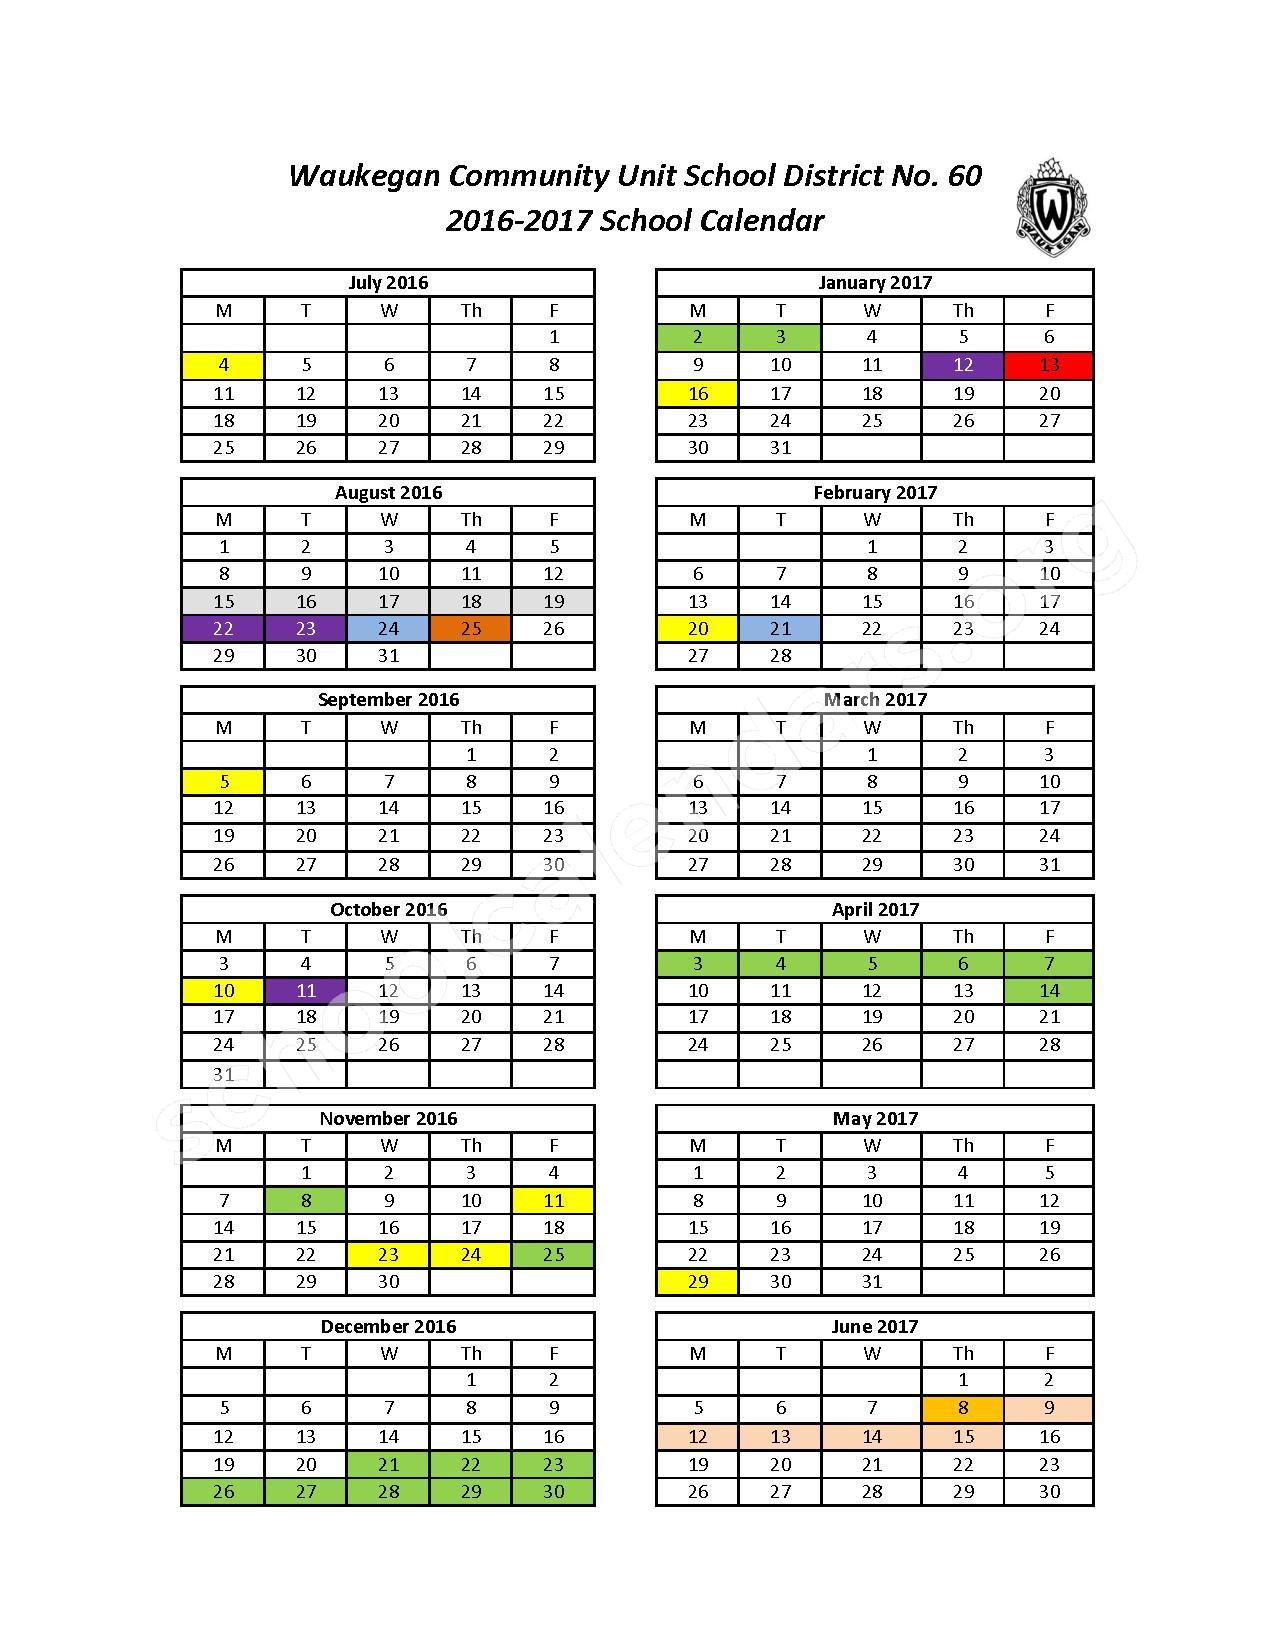 2016 - 2017 School Calendar – Waukegan Community Unit School District 60 – page 1